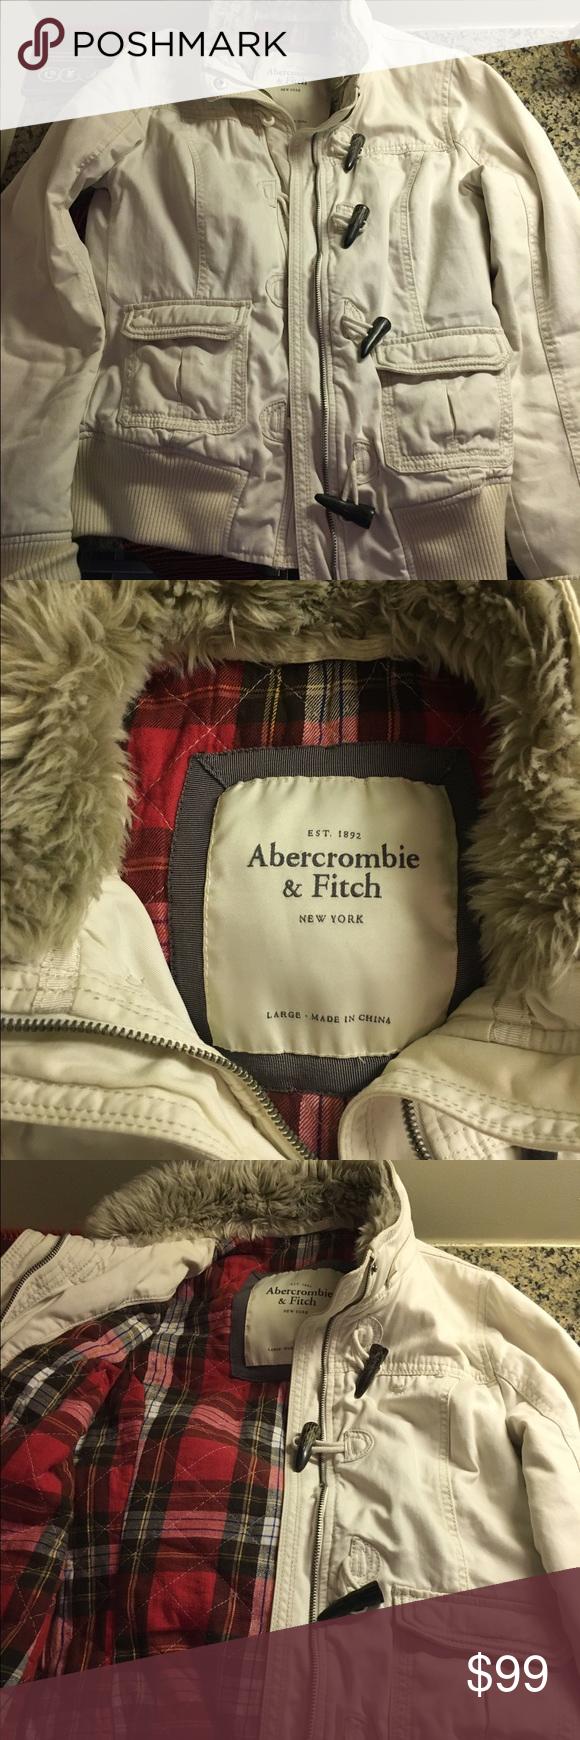 Abercrombie jacket Great abercrombie jacket, siZe large Abercrombie & Fitch Jackets & Coats